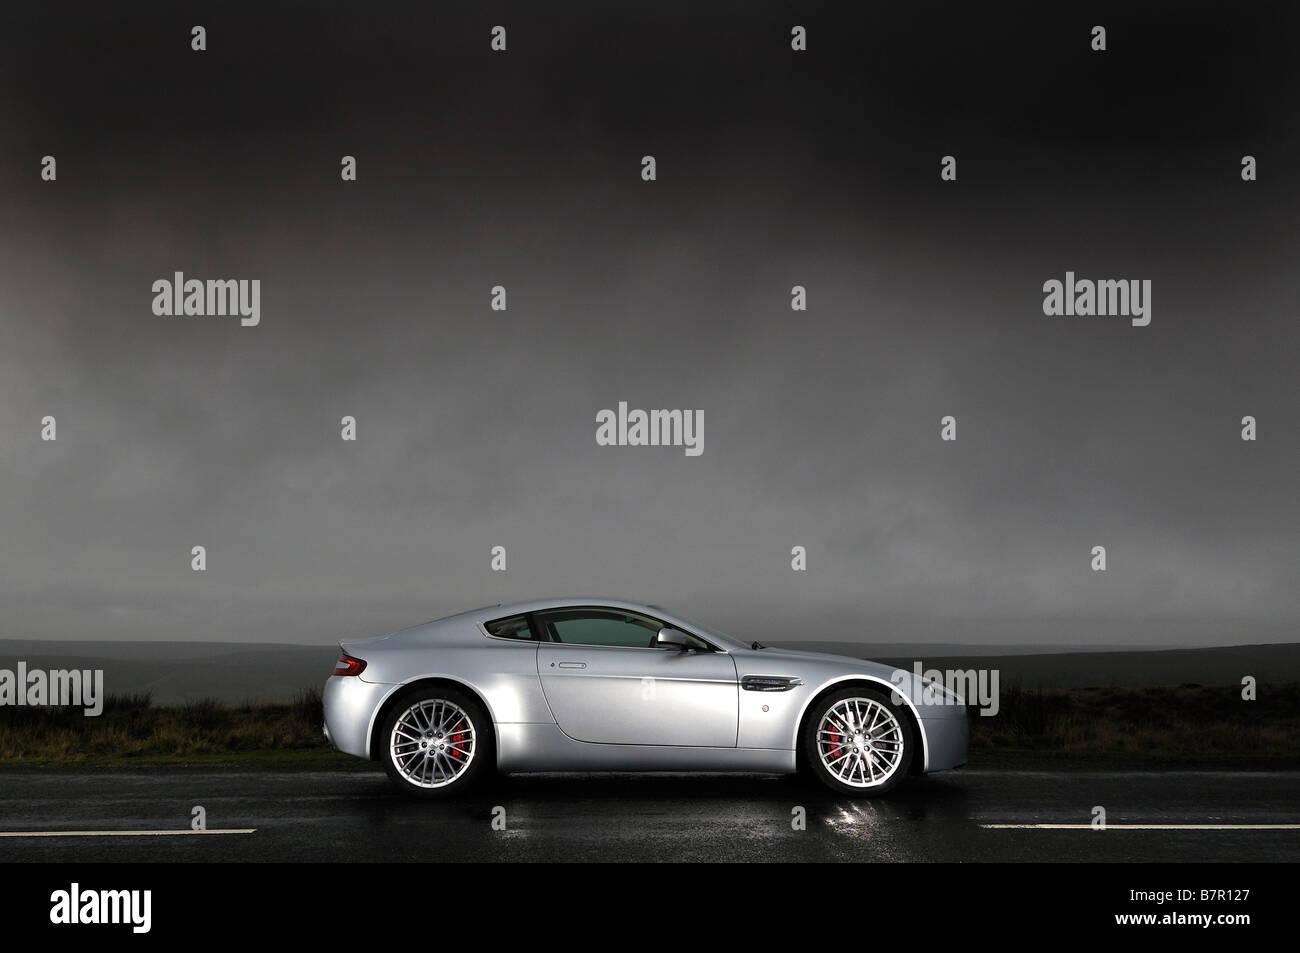 Aston Martin V8 Vantage - Stock Image